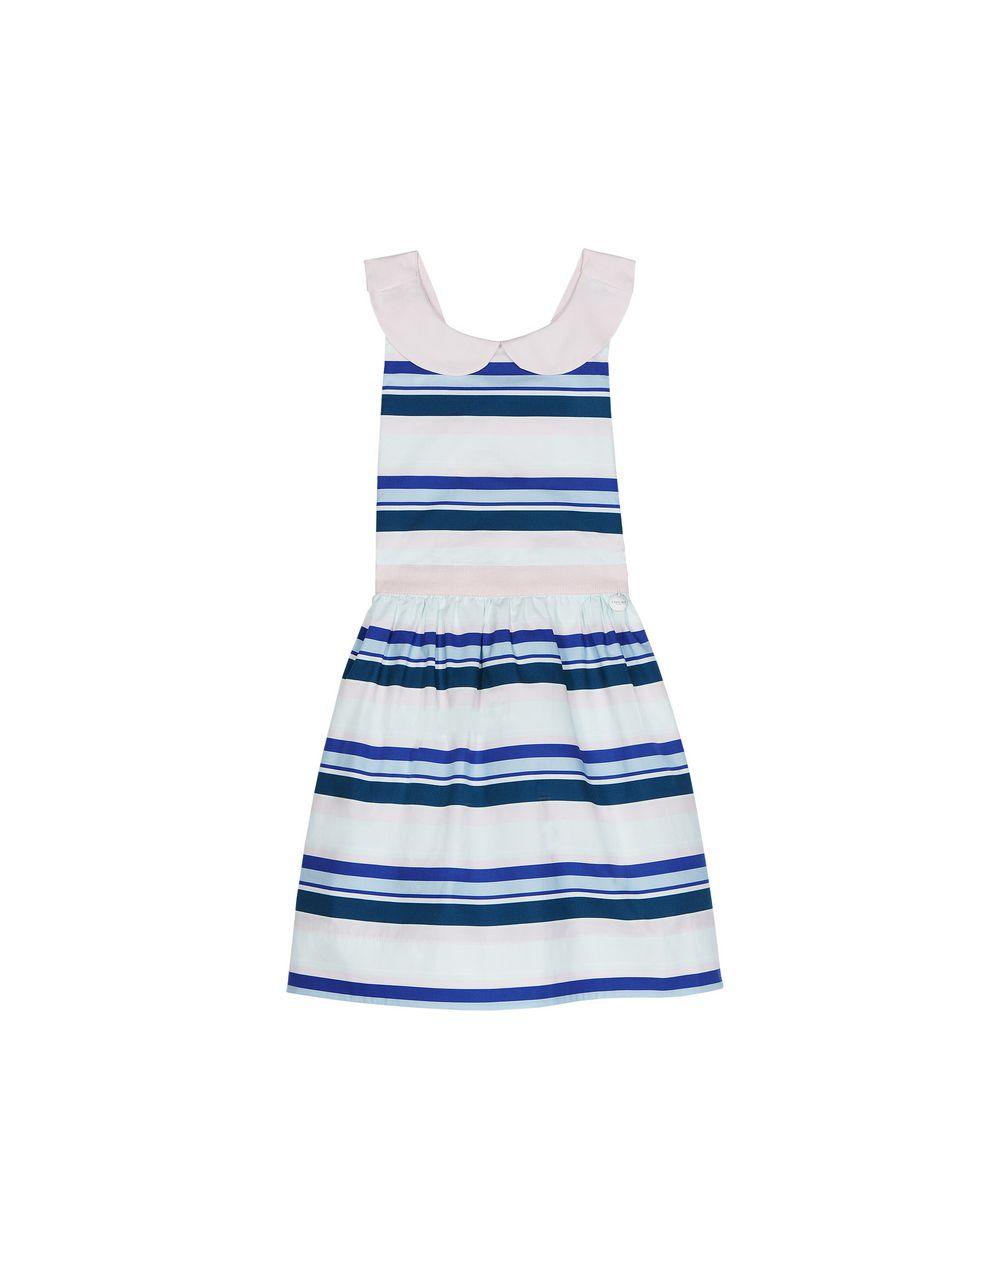 STRIPED DRESS  - Lanvin